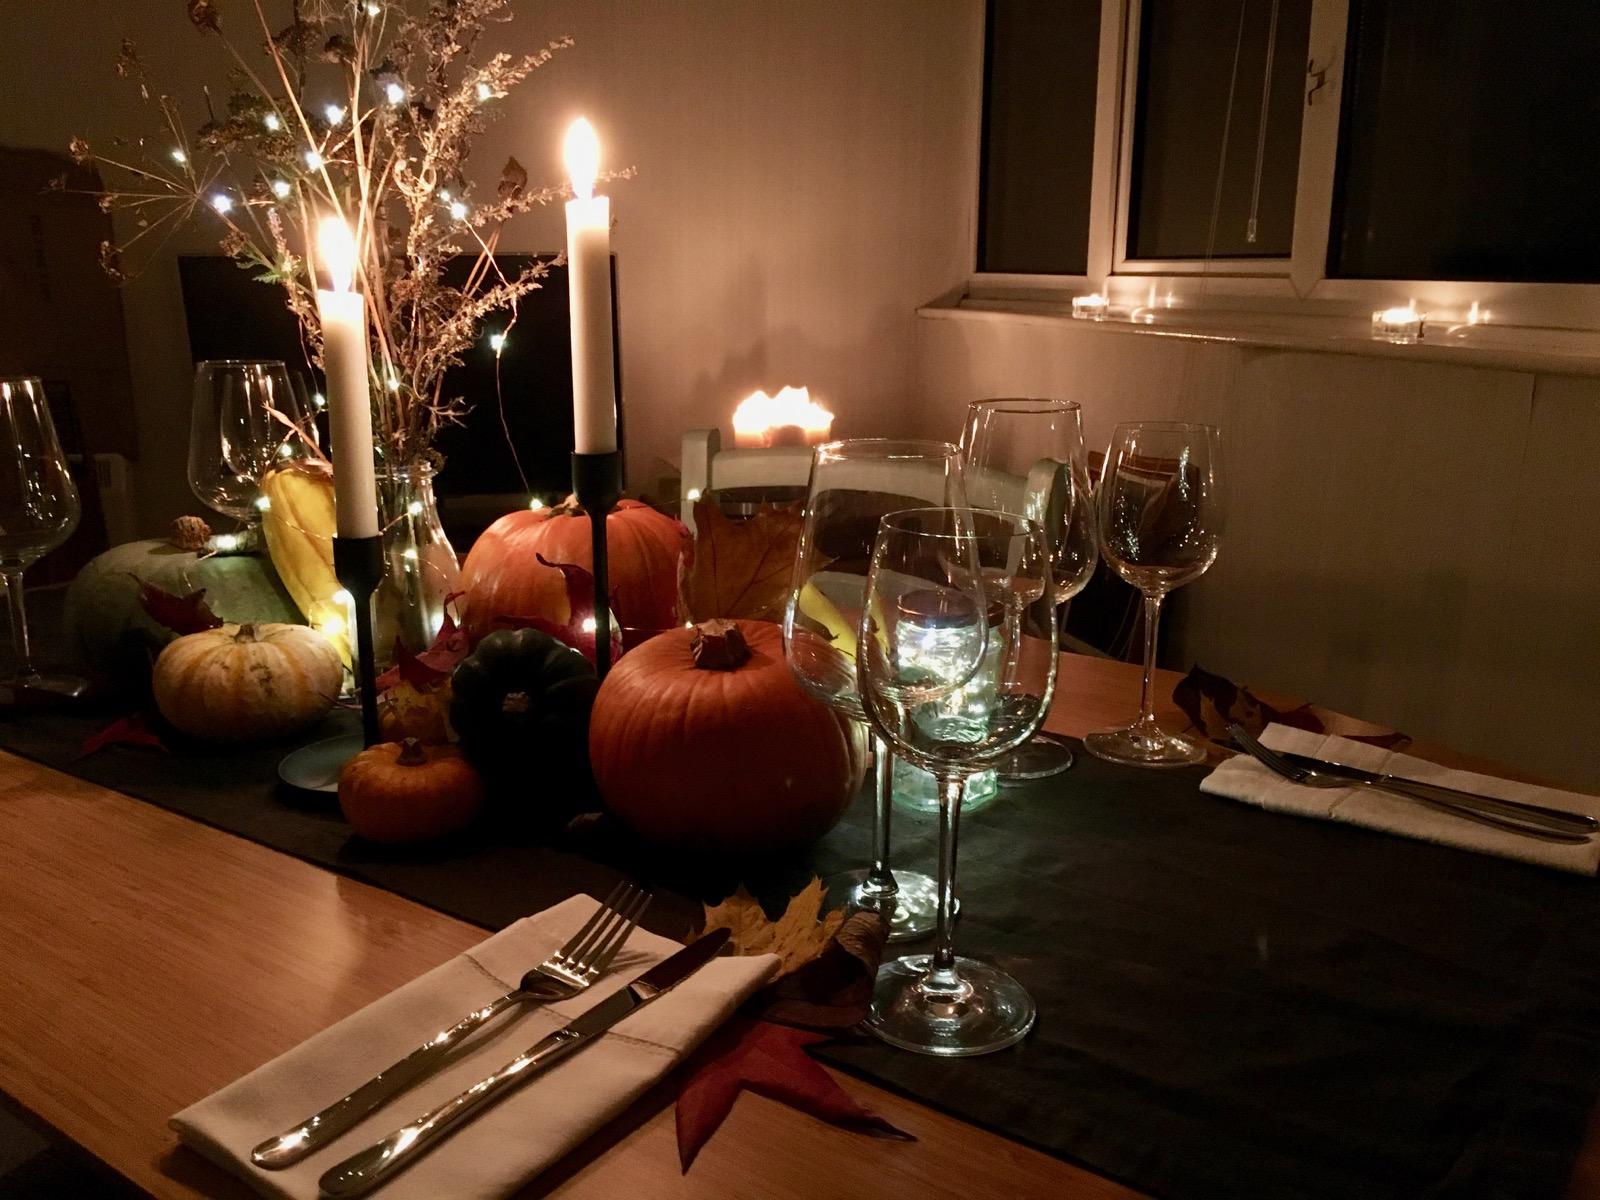 Autumn Candlelit Table Setting